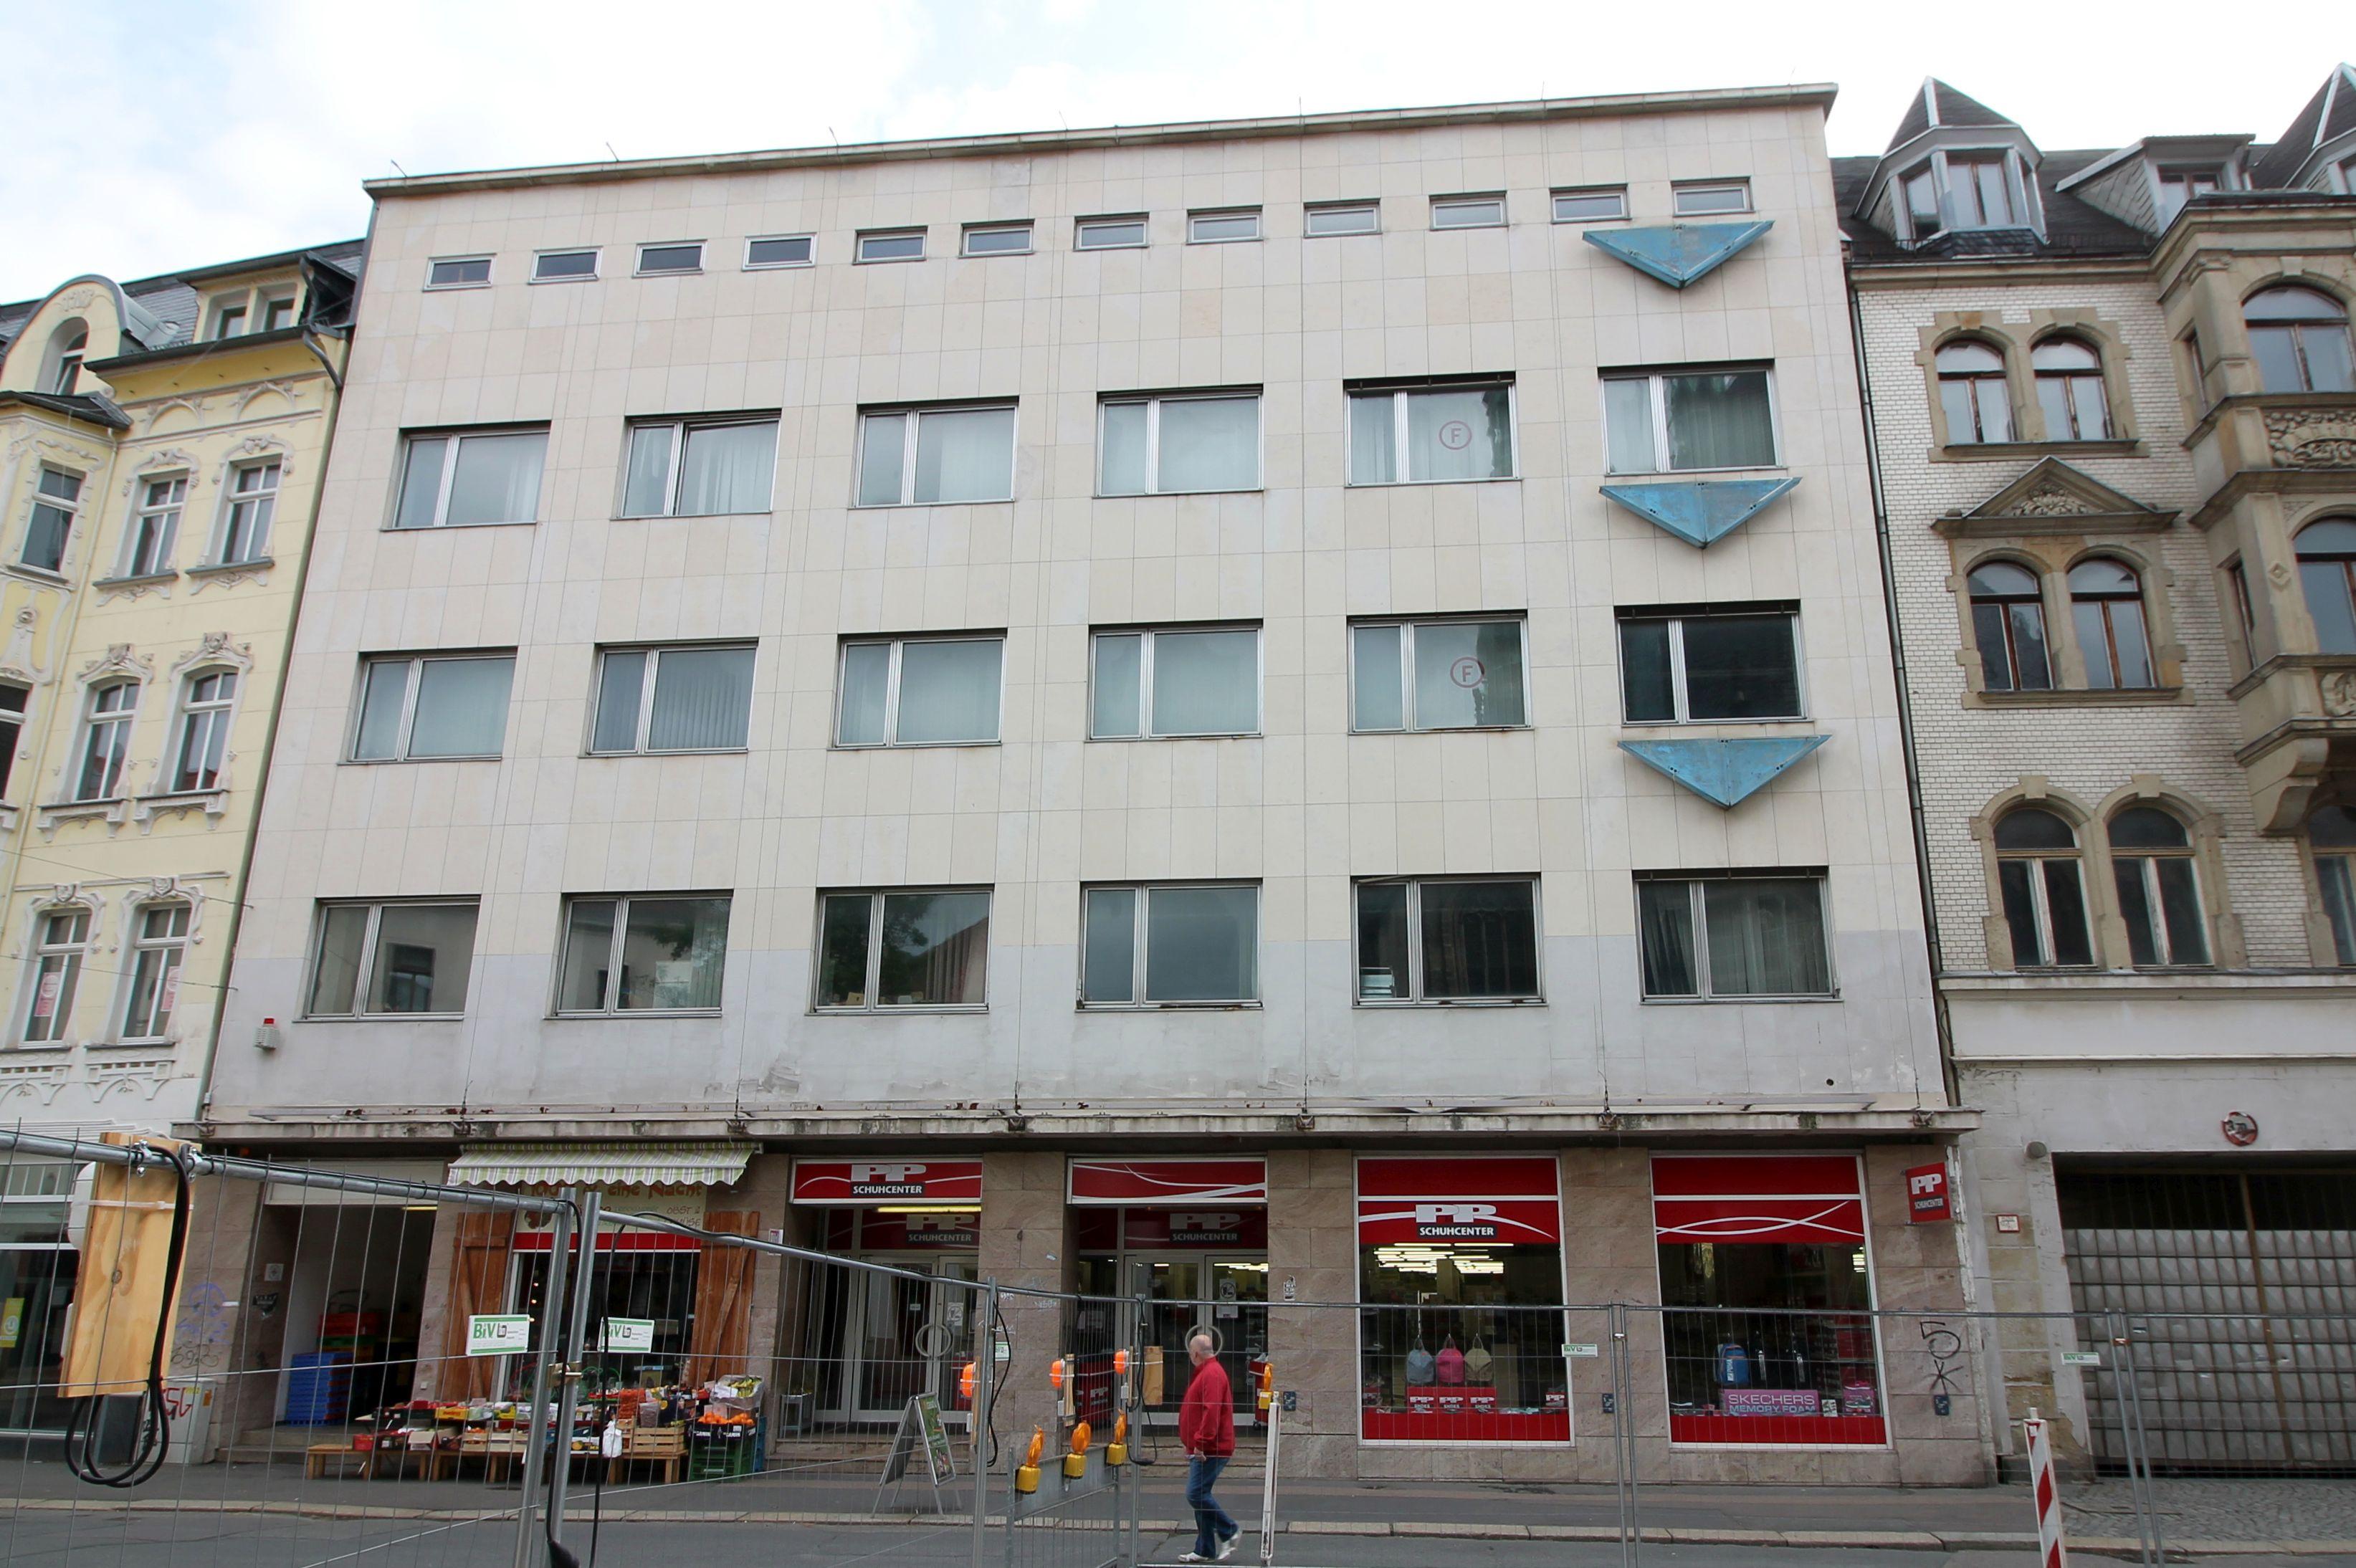 Datei:Konsumentkaufhaus Zwickau 2.jpg – Wikipedia